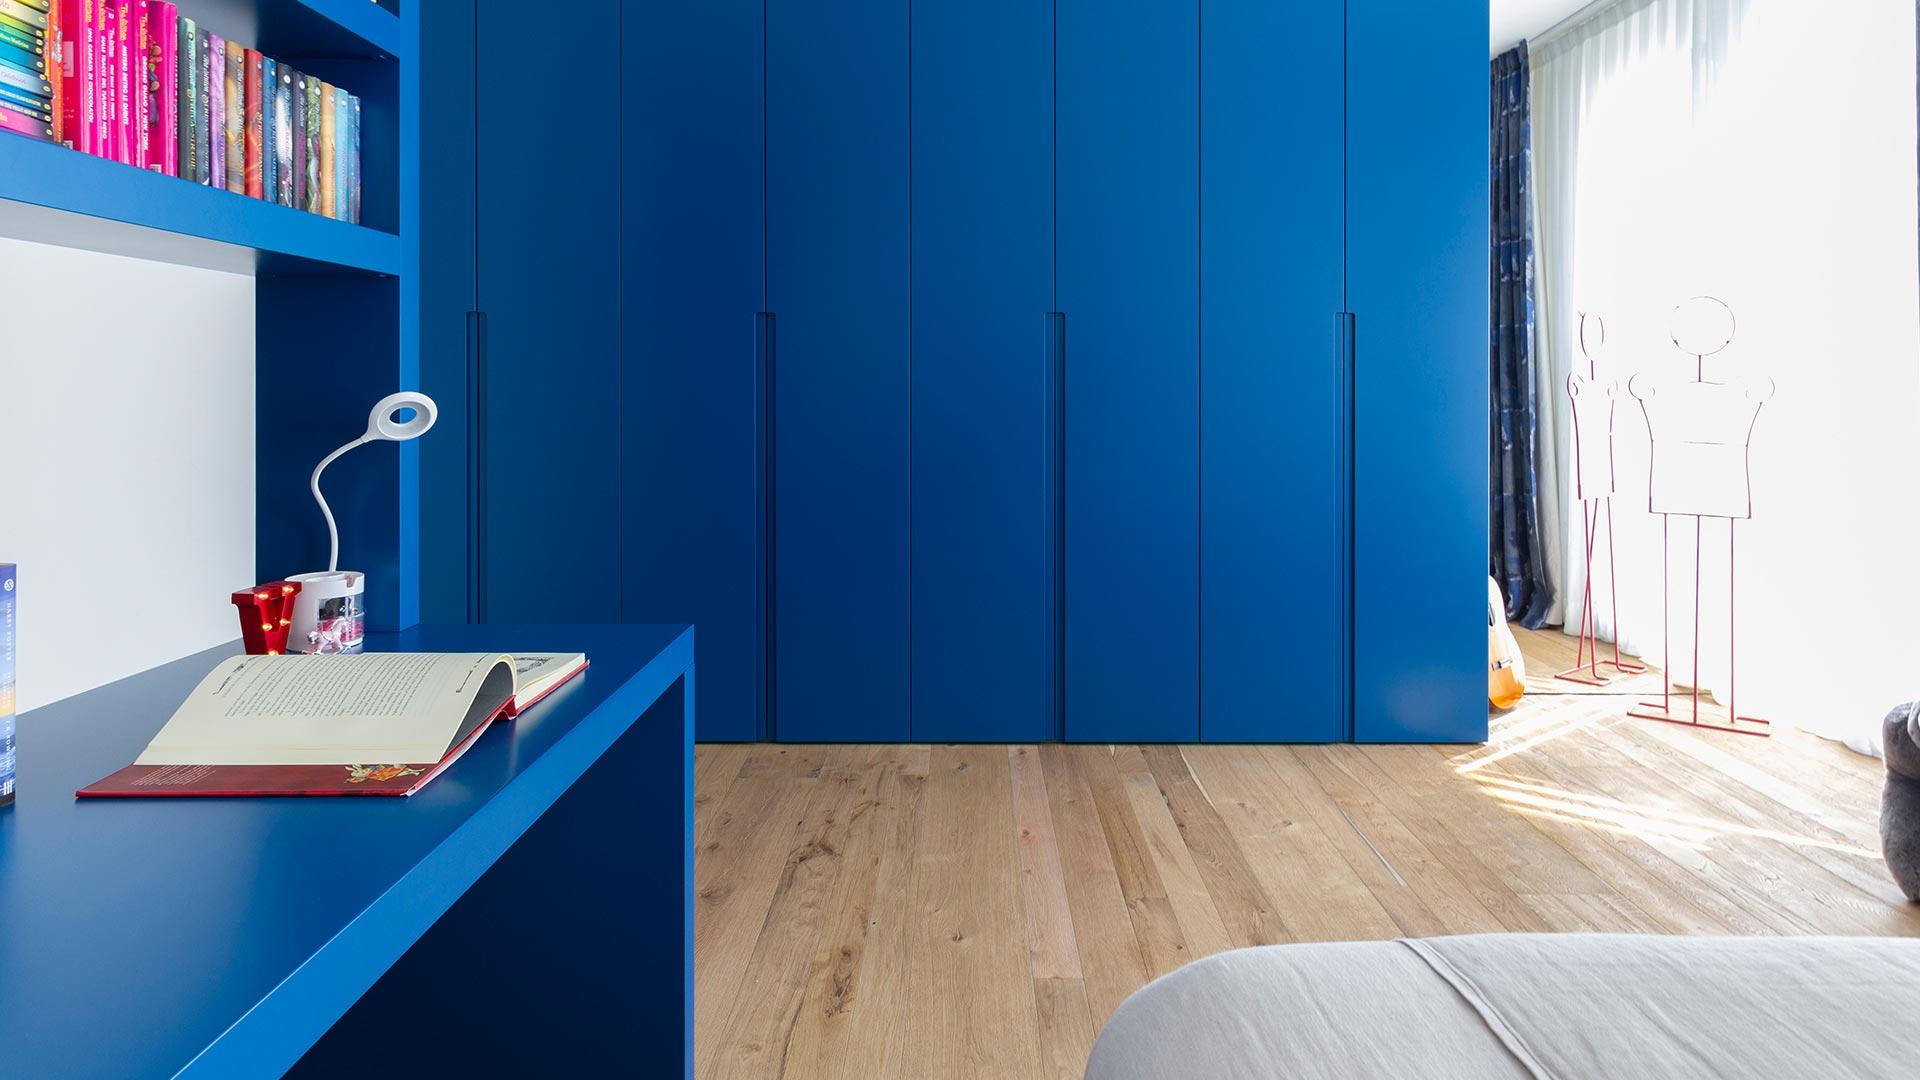 Turnkey bespoke interiors in Treviso realized by TM Italia - 202105_Bespoke_contract_Treviso-016